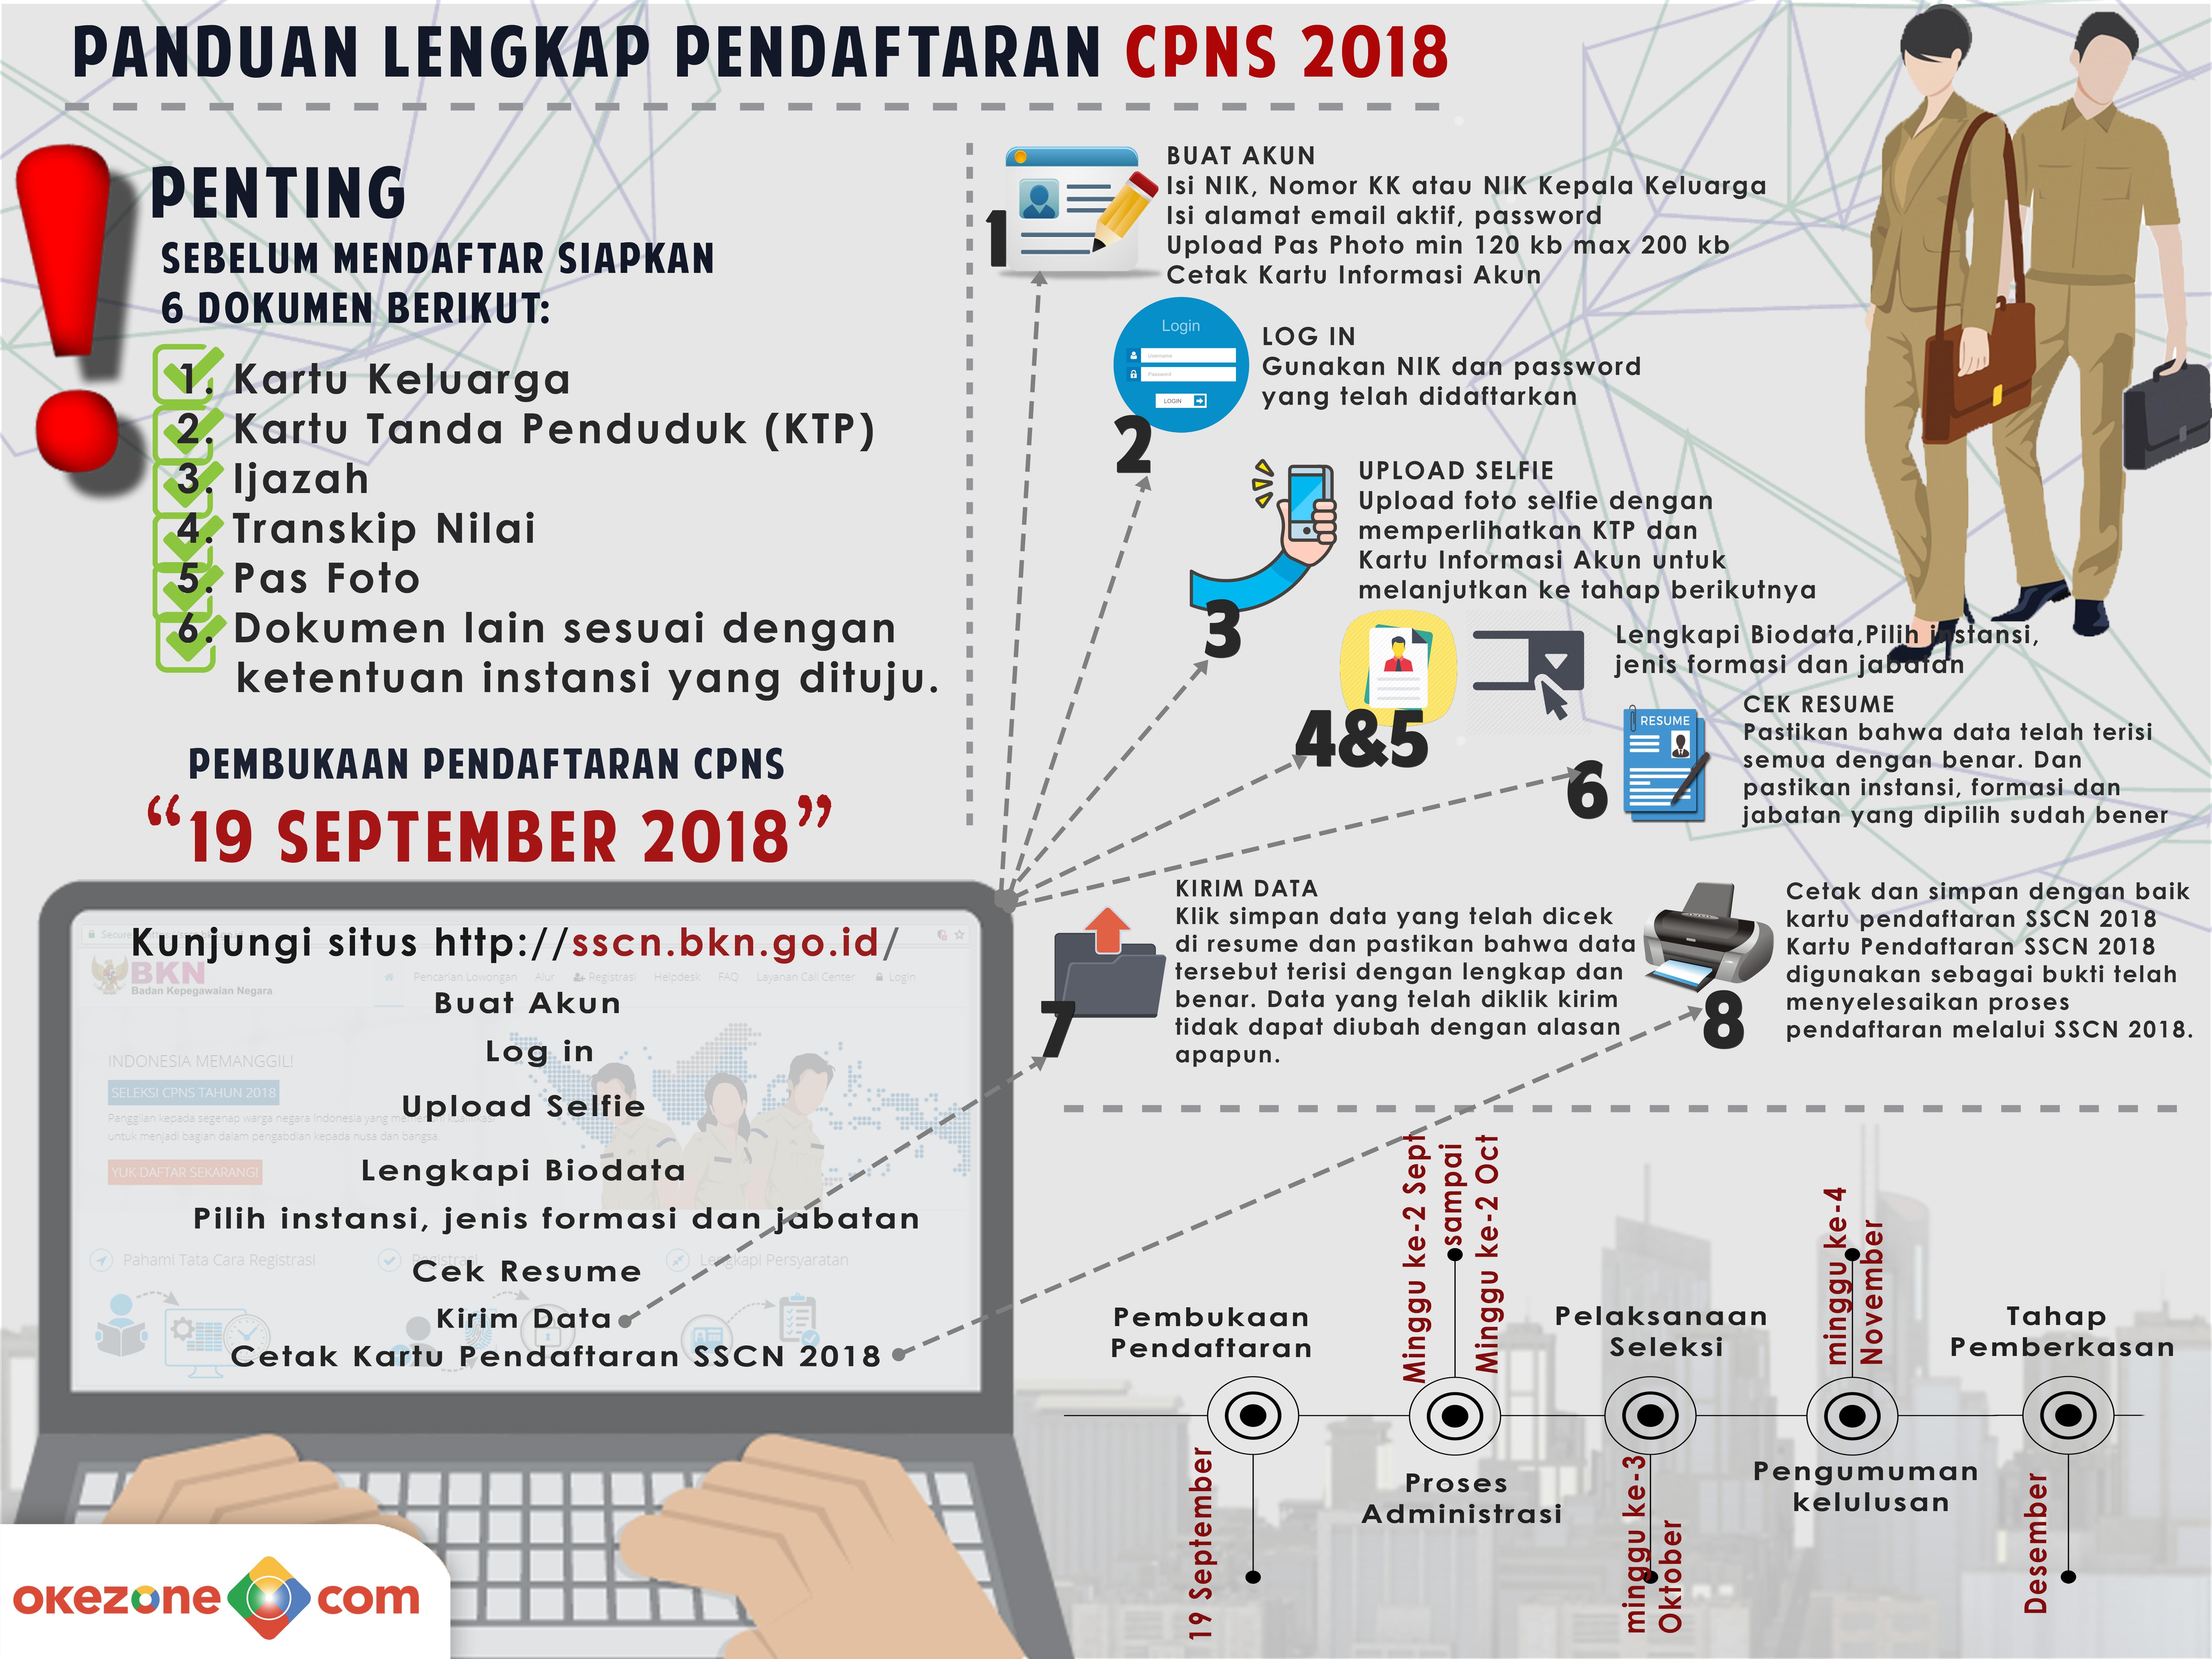 PENDAFTARAN LENGKAP CPNS 2018 -